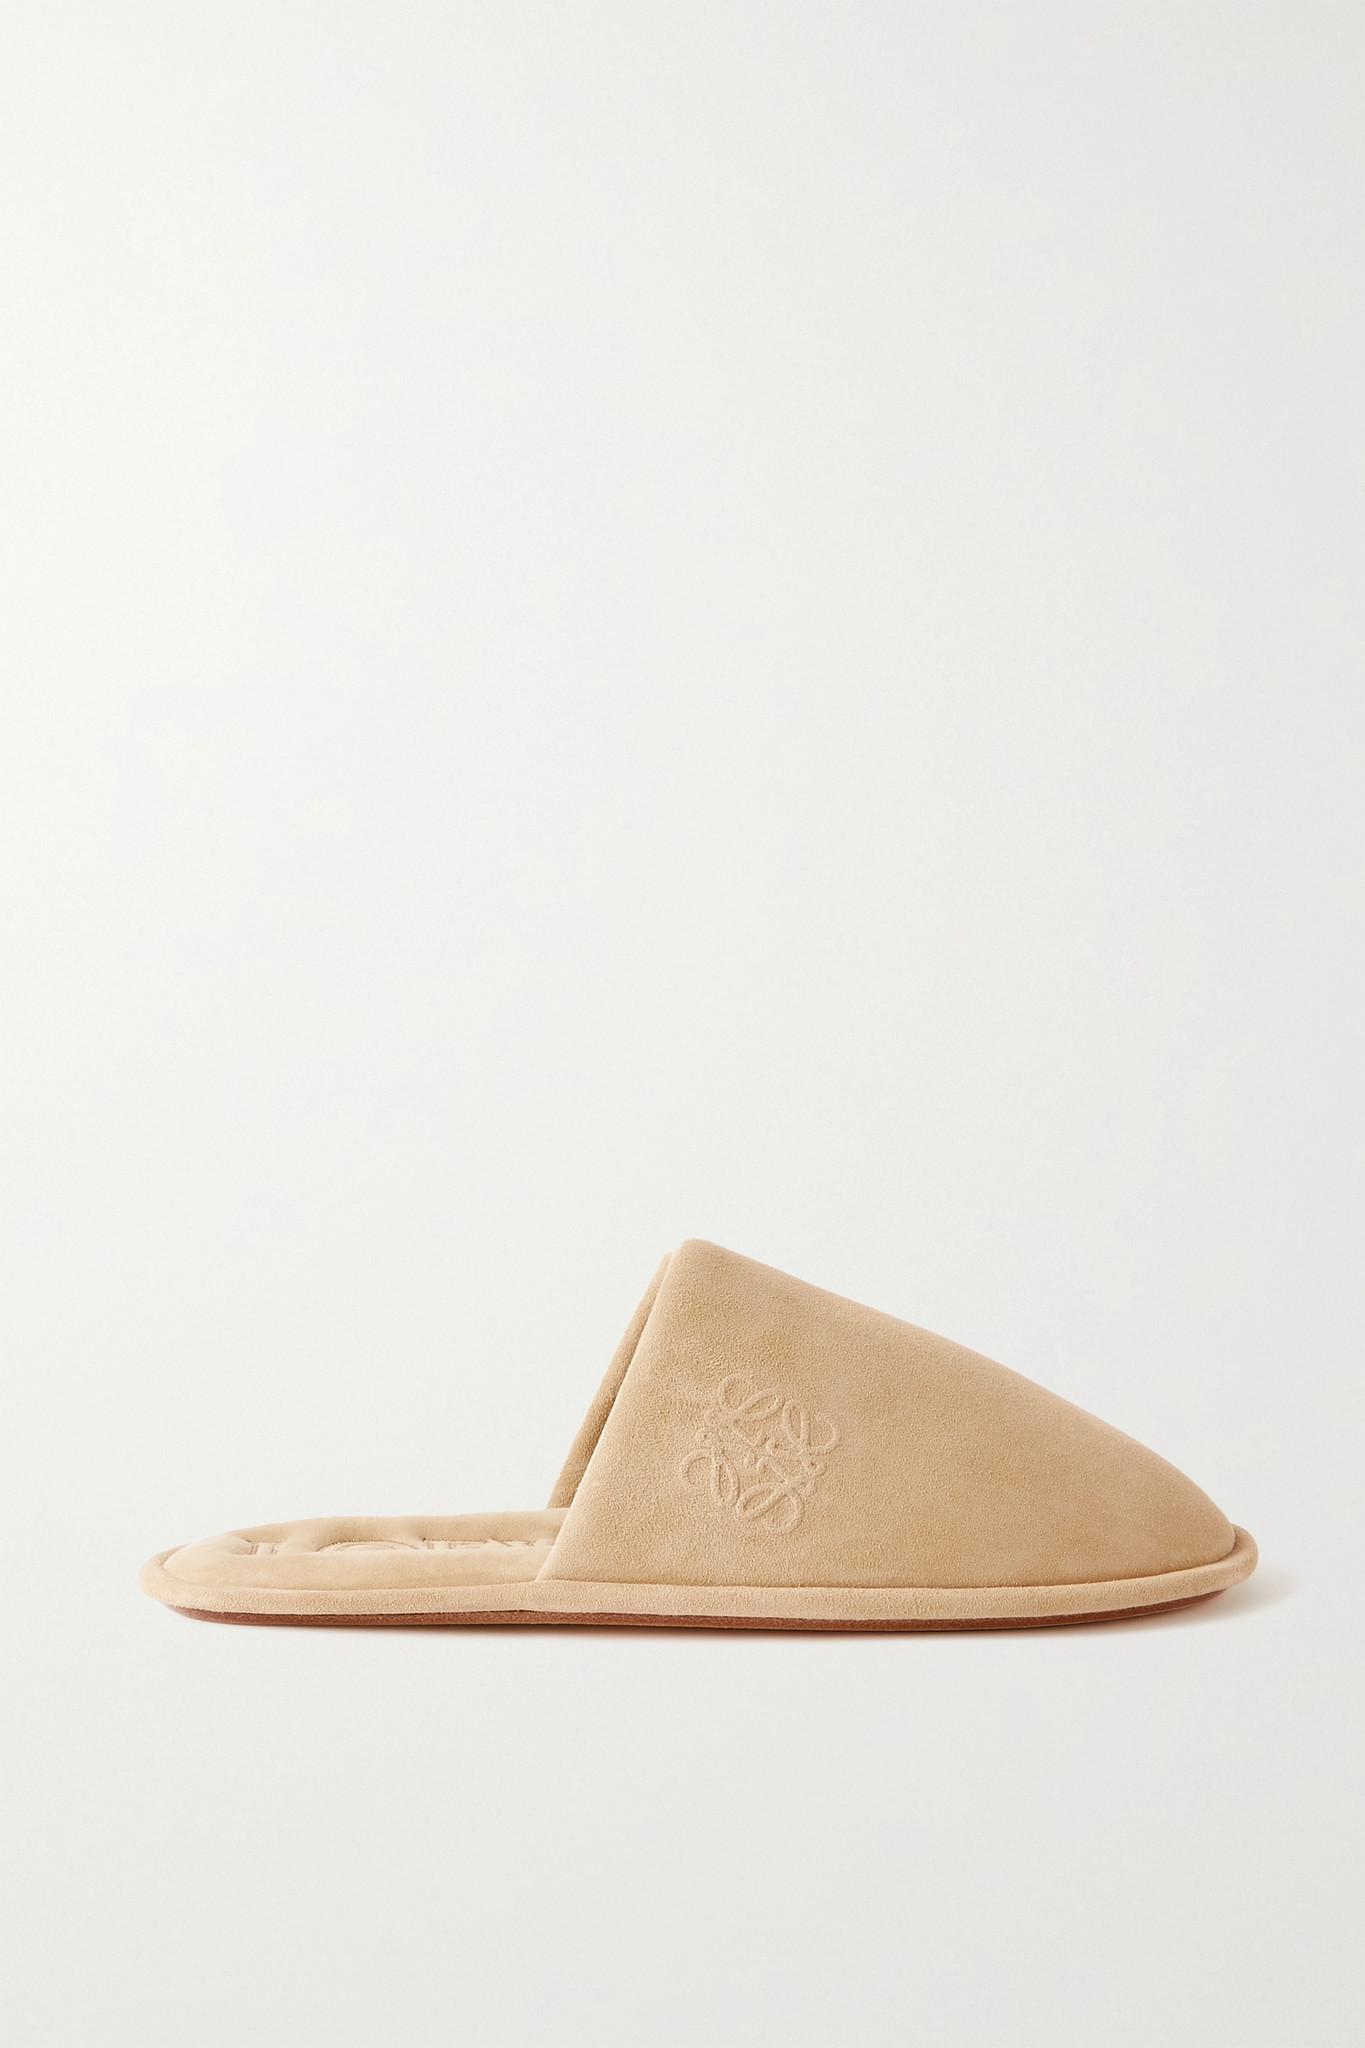 LOEWE - 绒面革拖鞋 - 中性色 - IT39